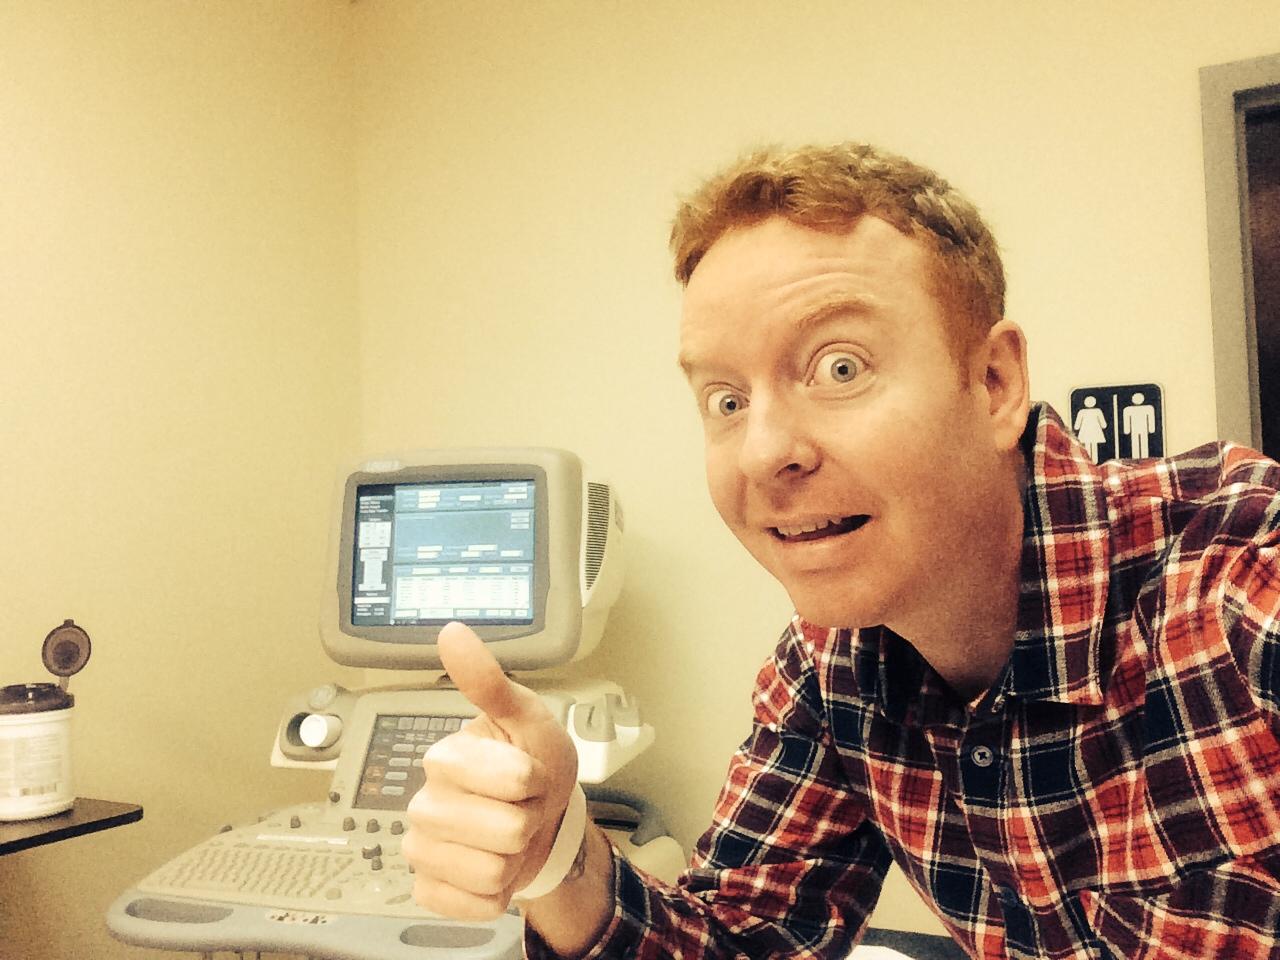 East Side Davey Mac - He wears plaid at hospitals.